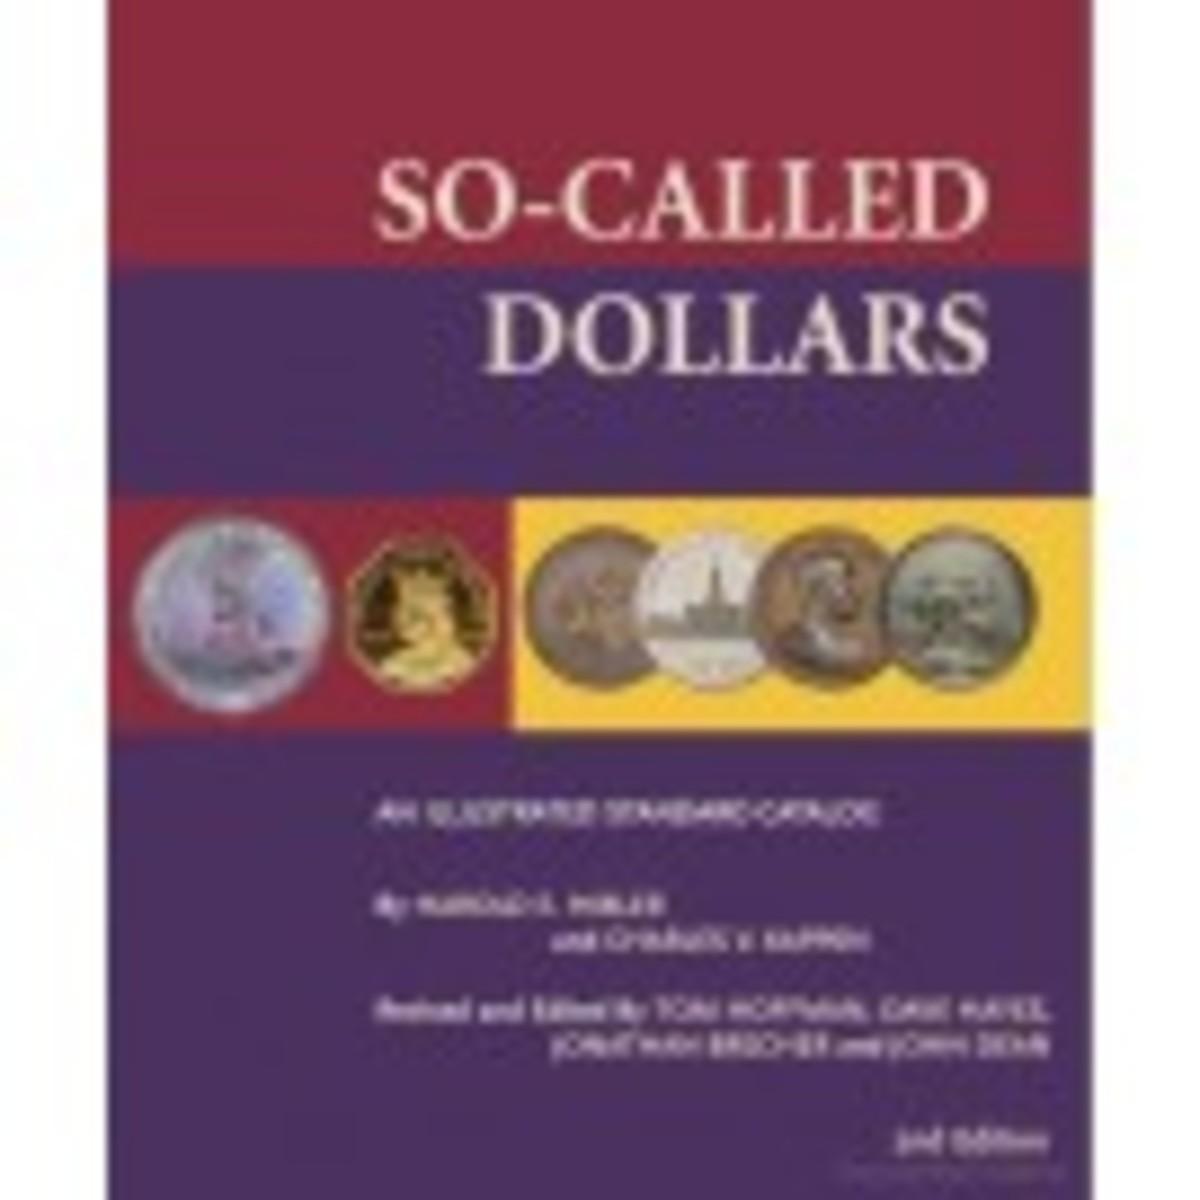 So-Called Dollars